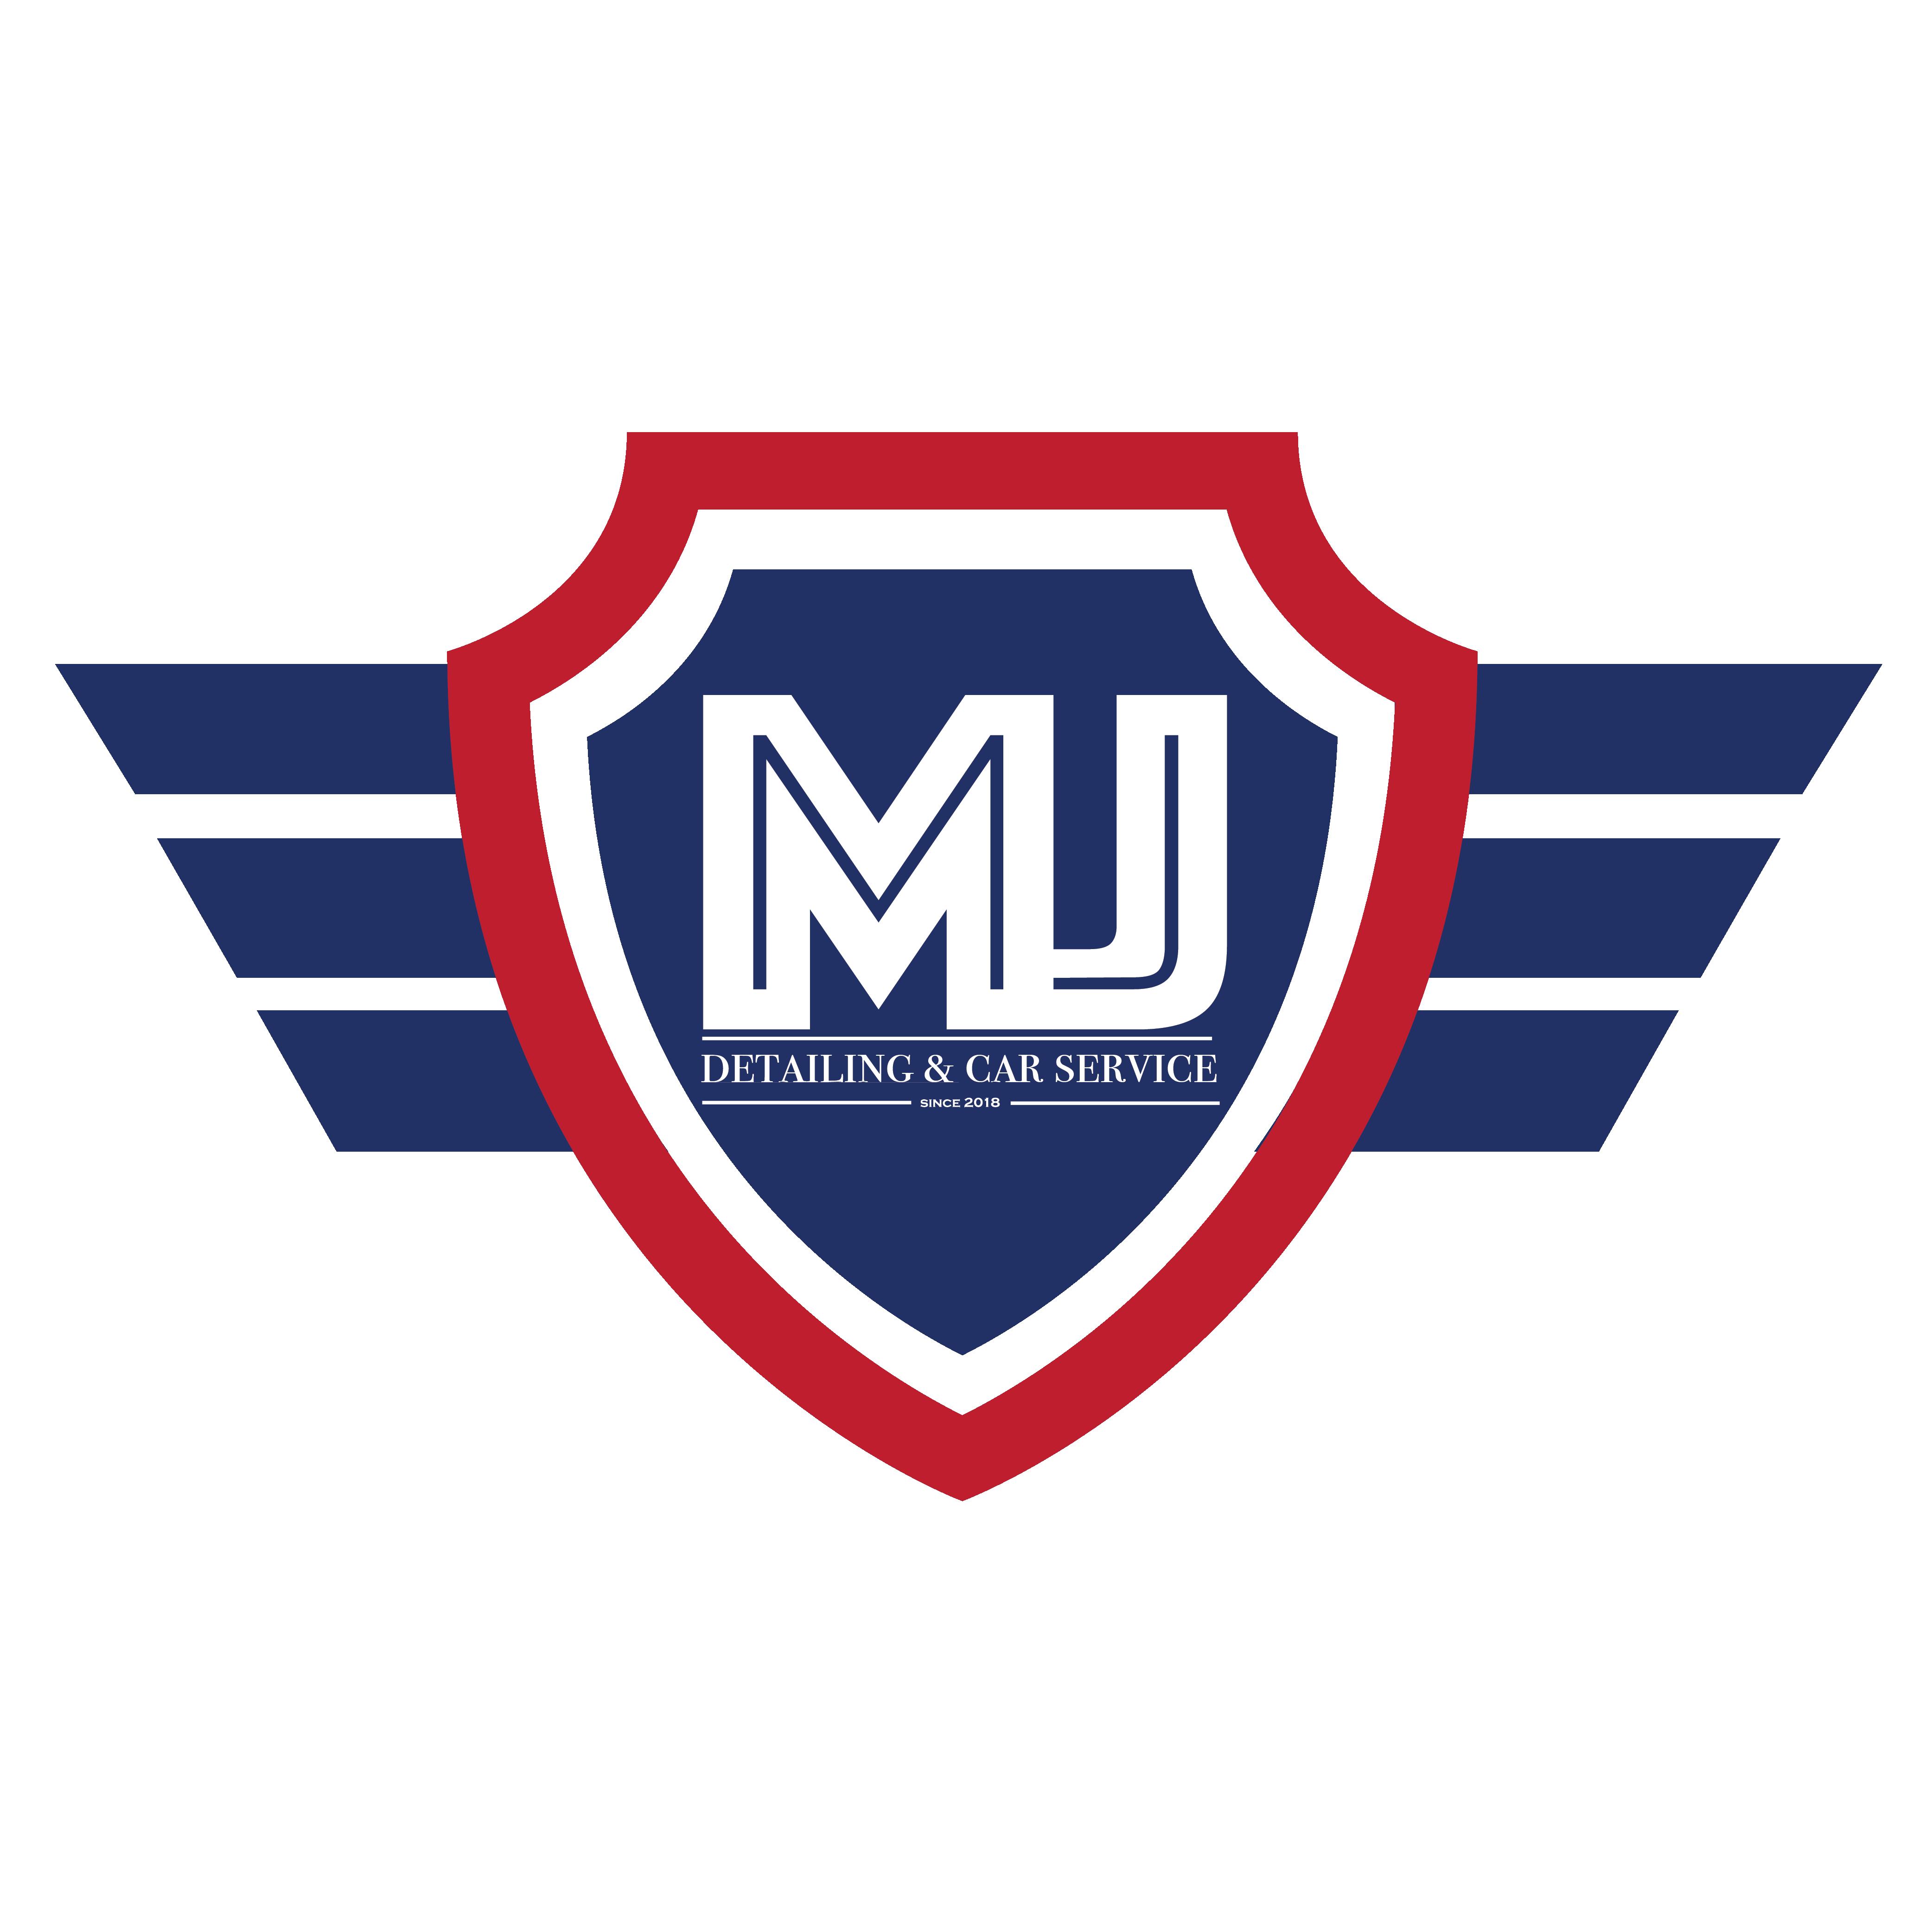 M.J. Car Detailing